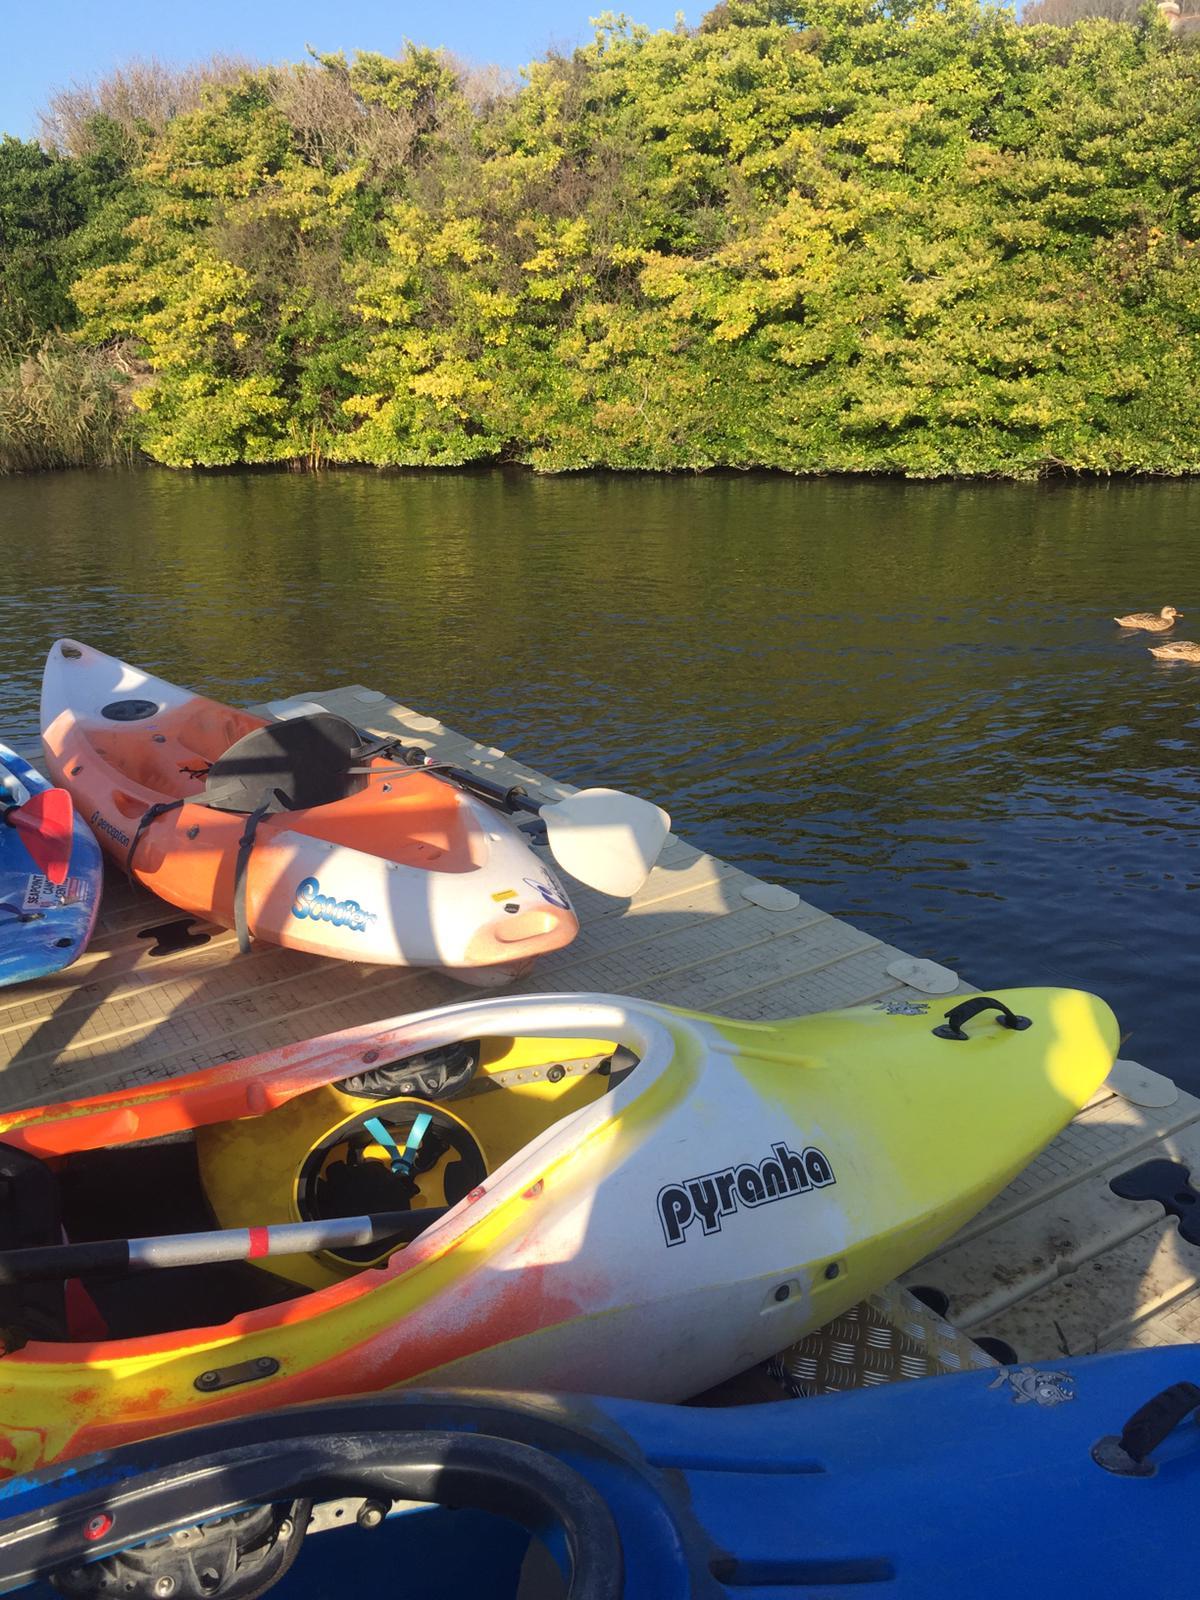 Seapoint Canoe Centre Canoes sunbathing on new pontoon Nov 2018.jpg